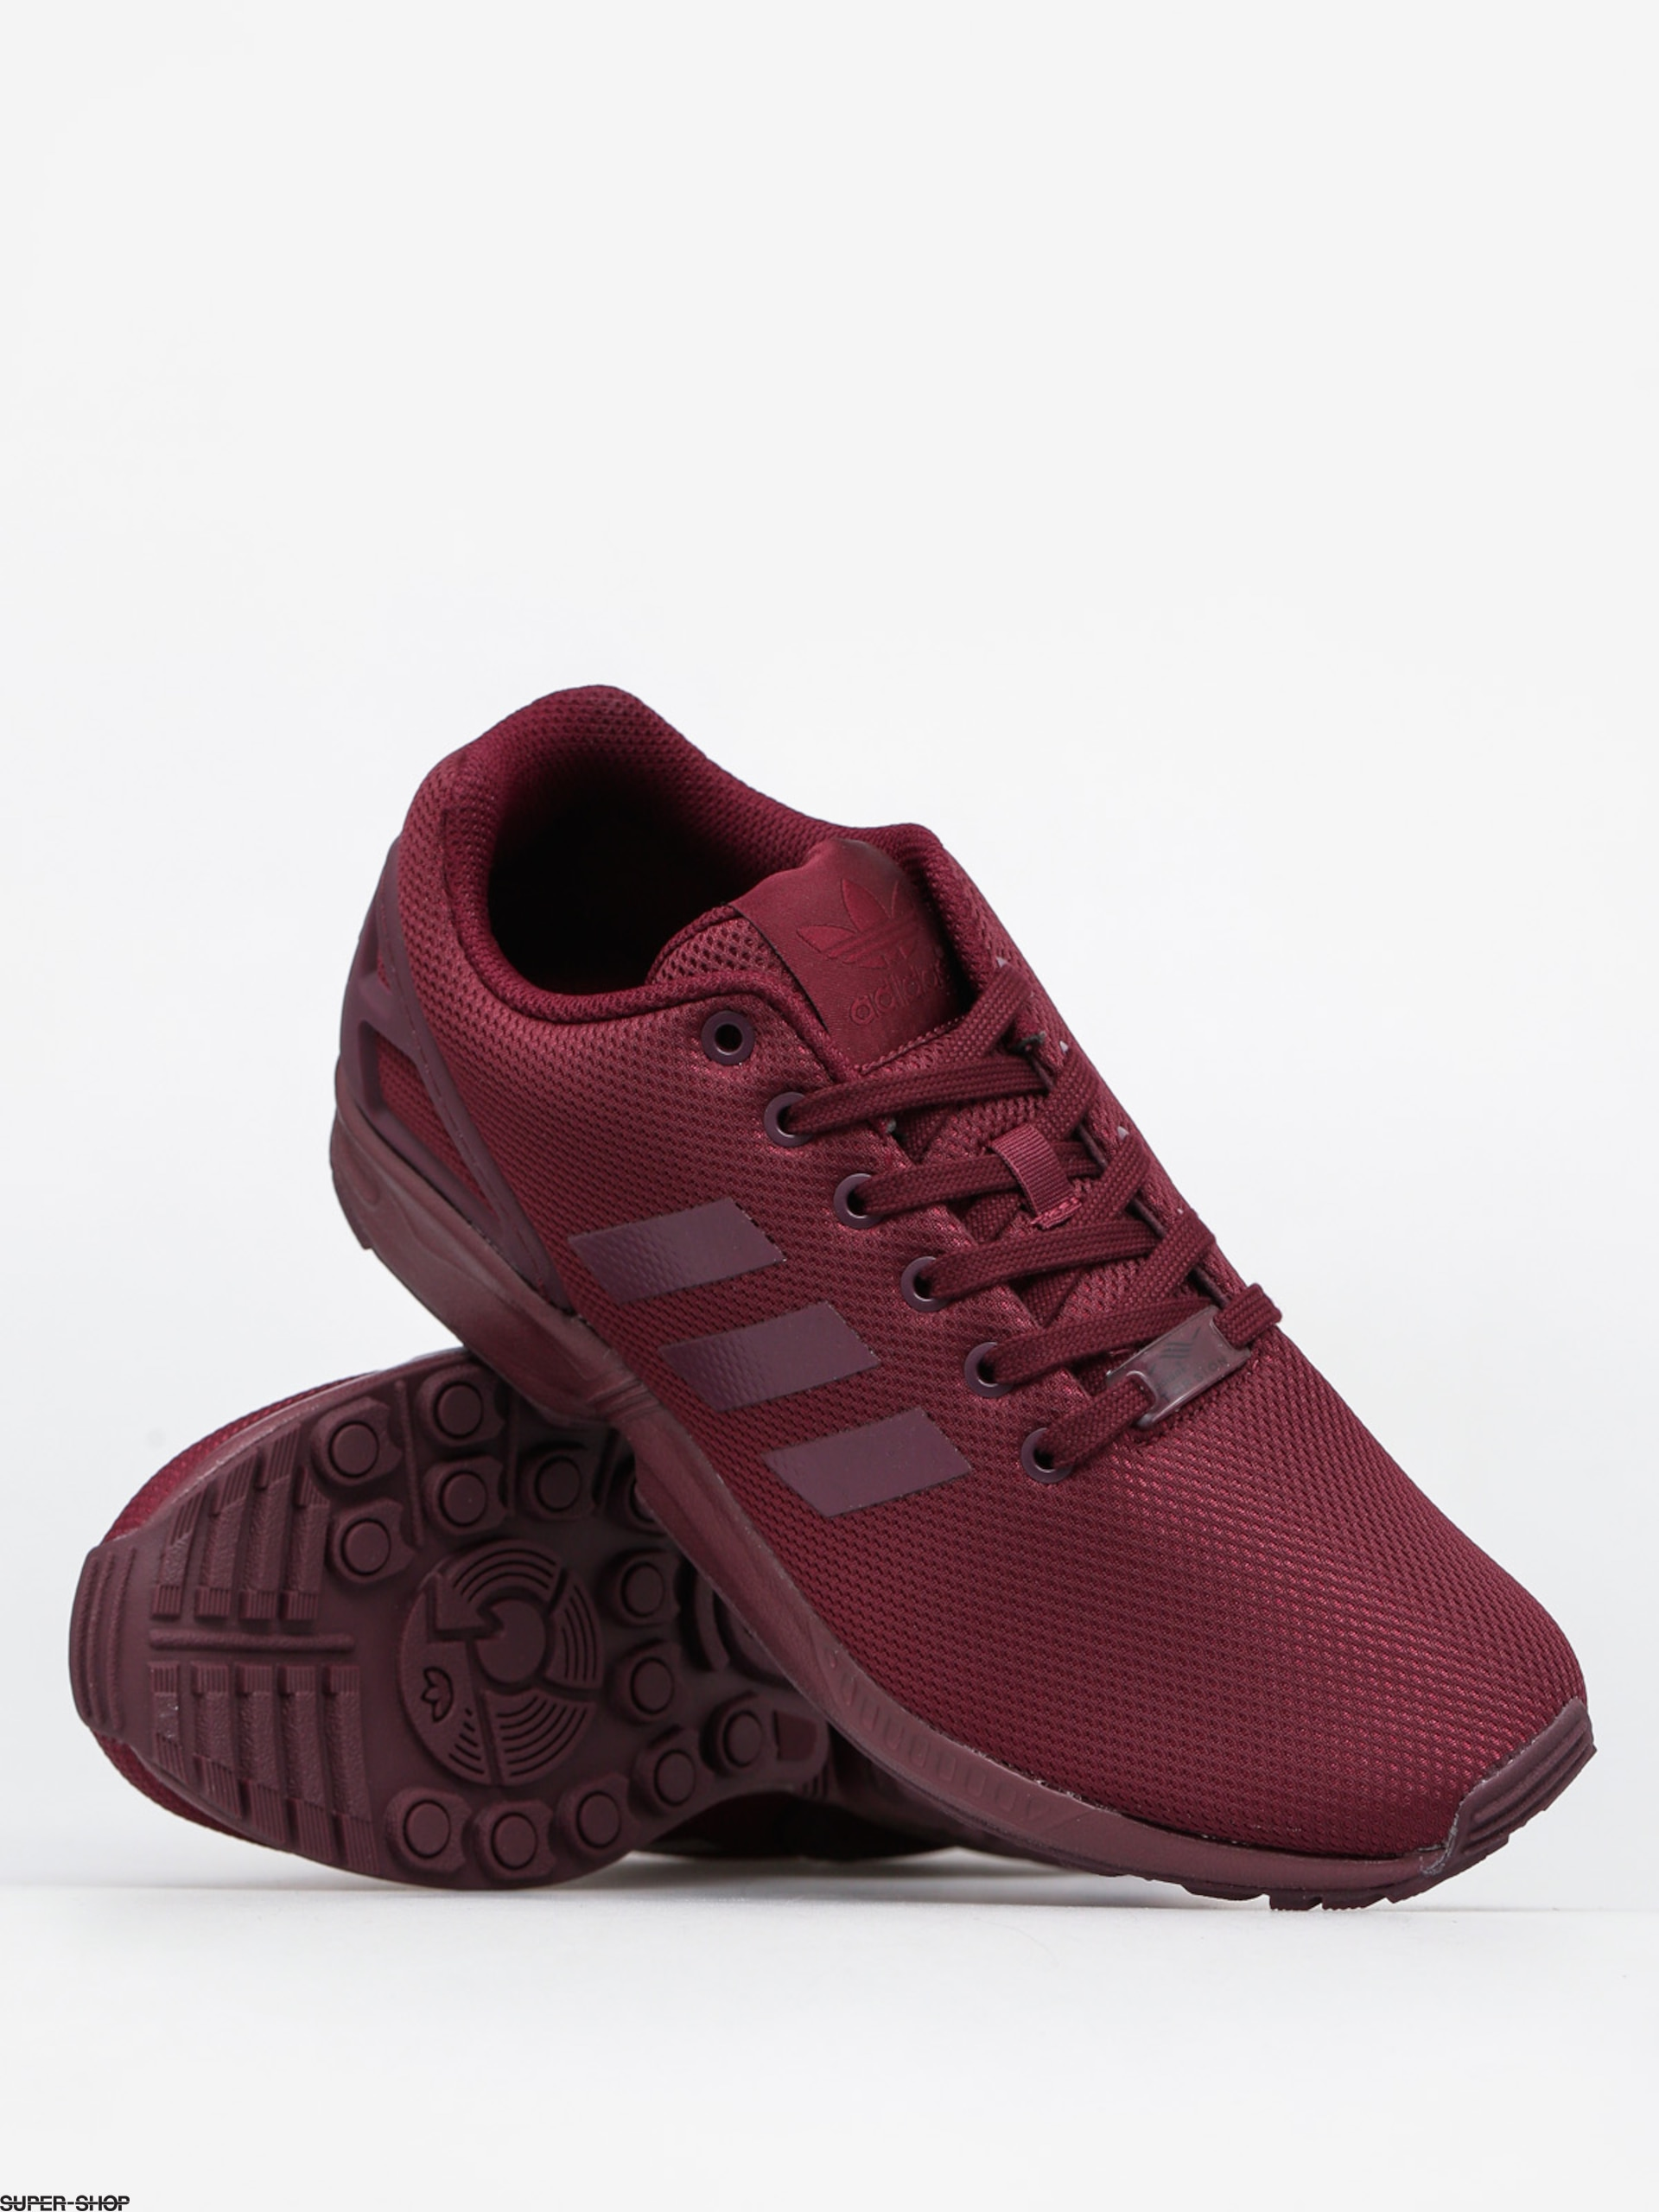 new style 8c1aa a9496 adidas Schuhe Zx Flux (maroon/ftwwht/cblack)